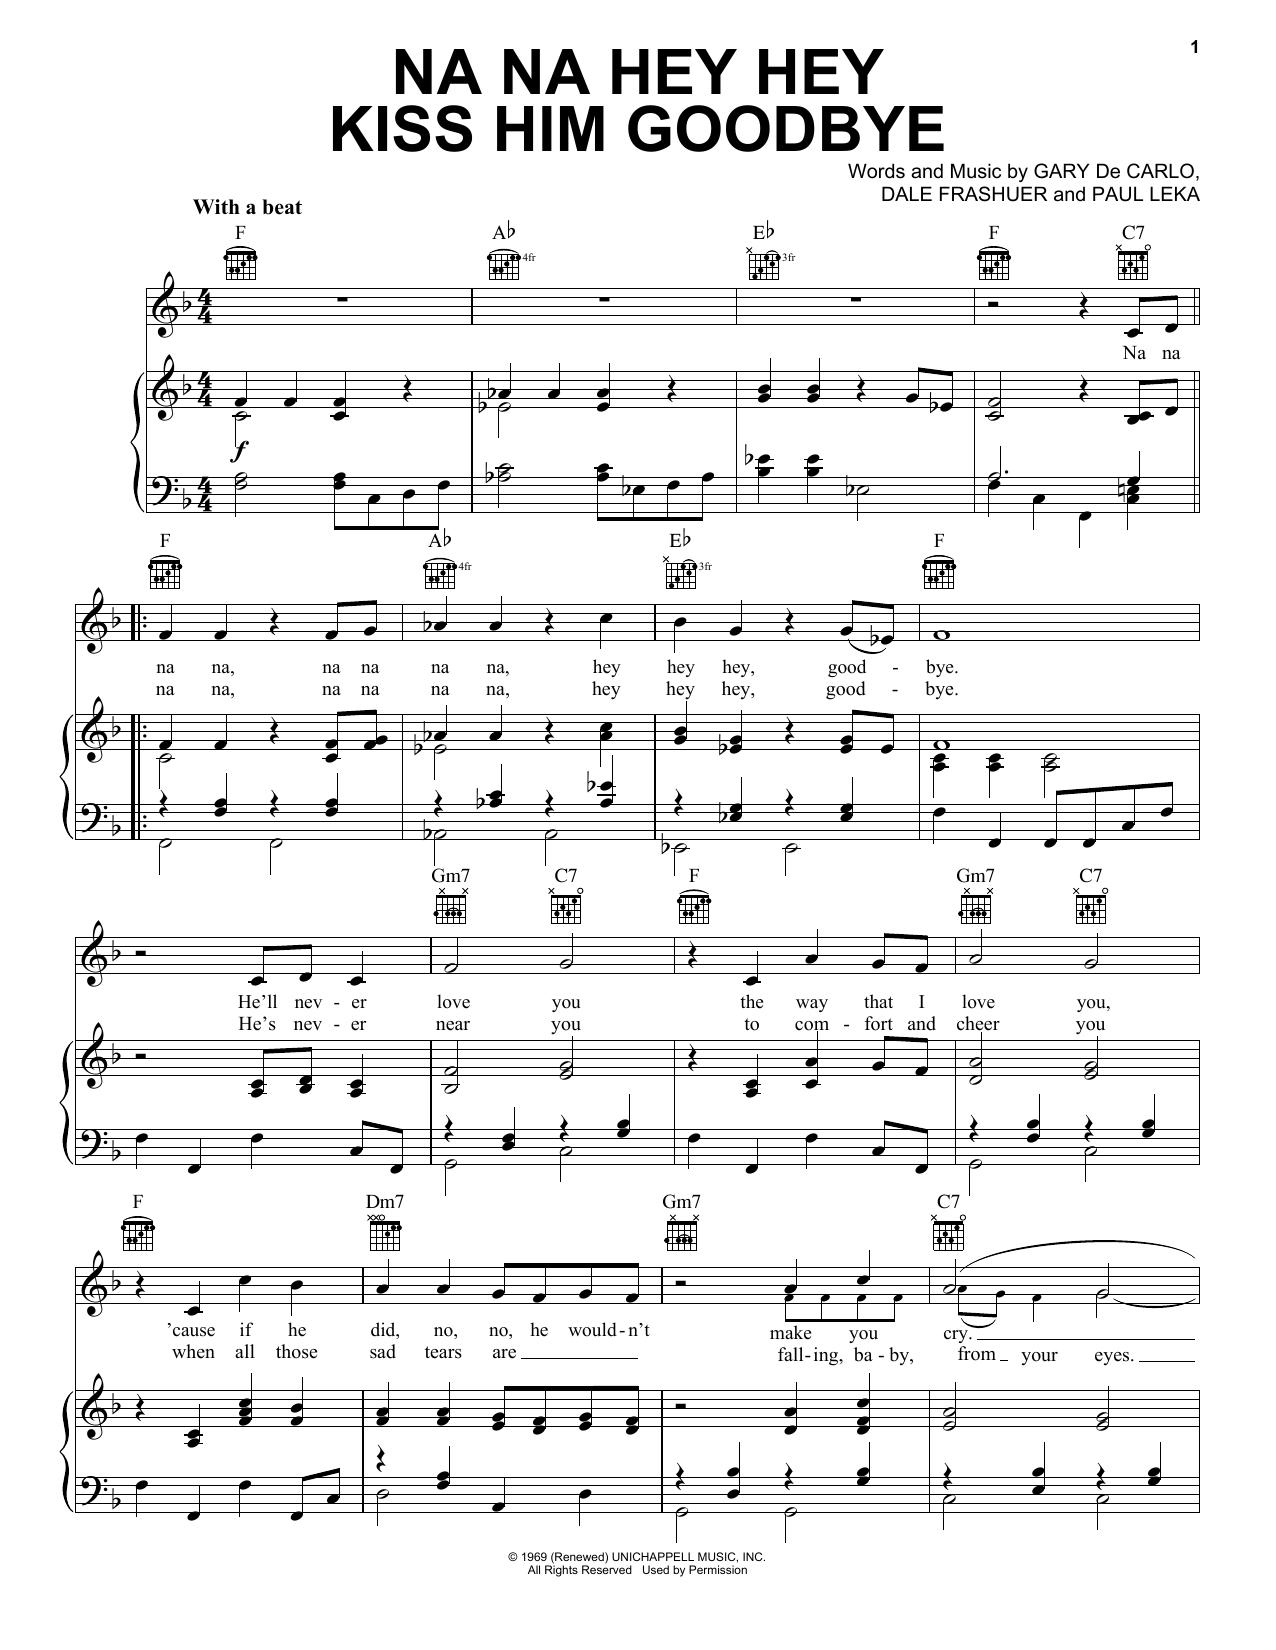 Steam Na Na Hey Hey Kiss Him Goodbye sheet music notes printable PDF score